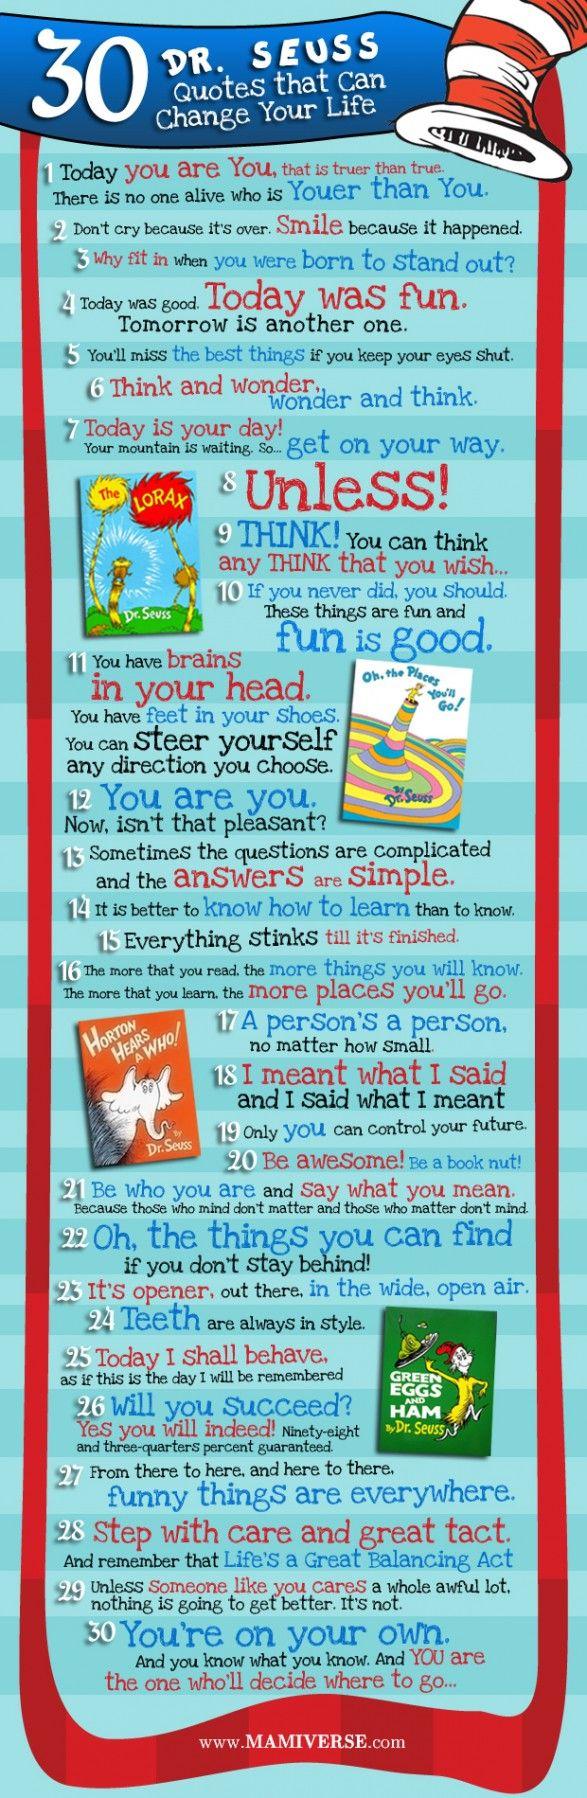 Dr Seuss Quotes About Friendship 30 Drseuss Quotes  School And Wisdom